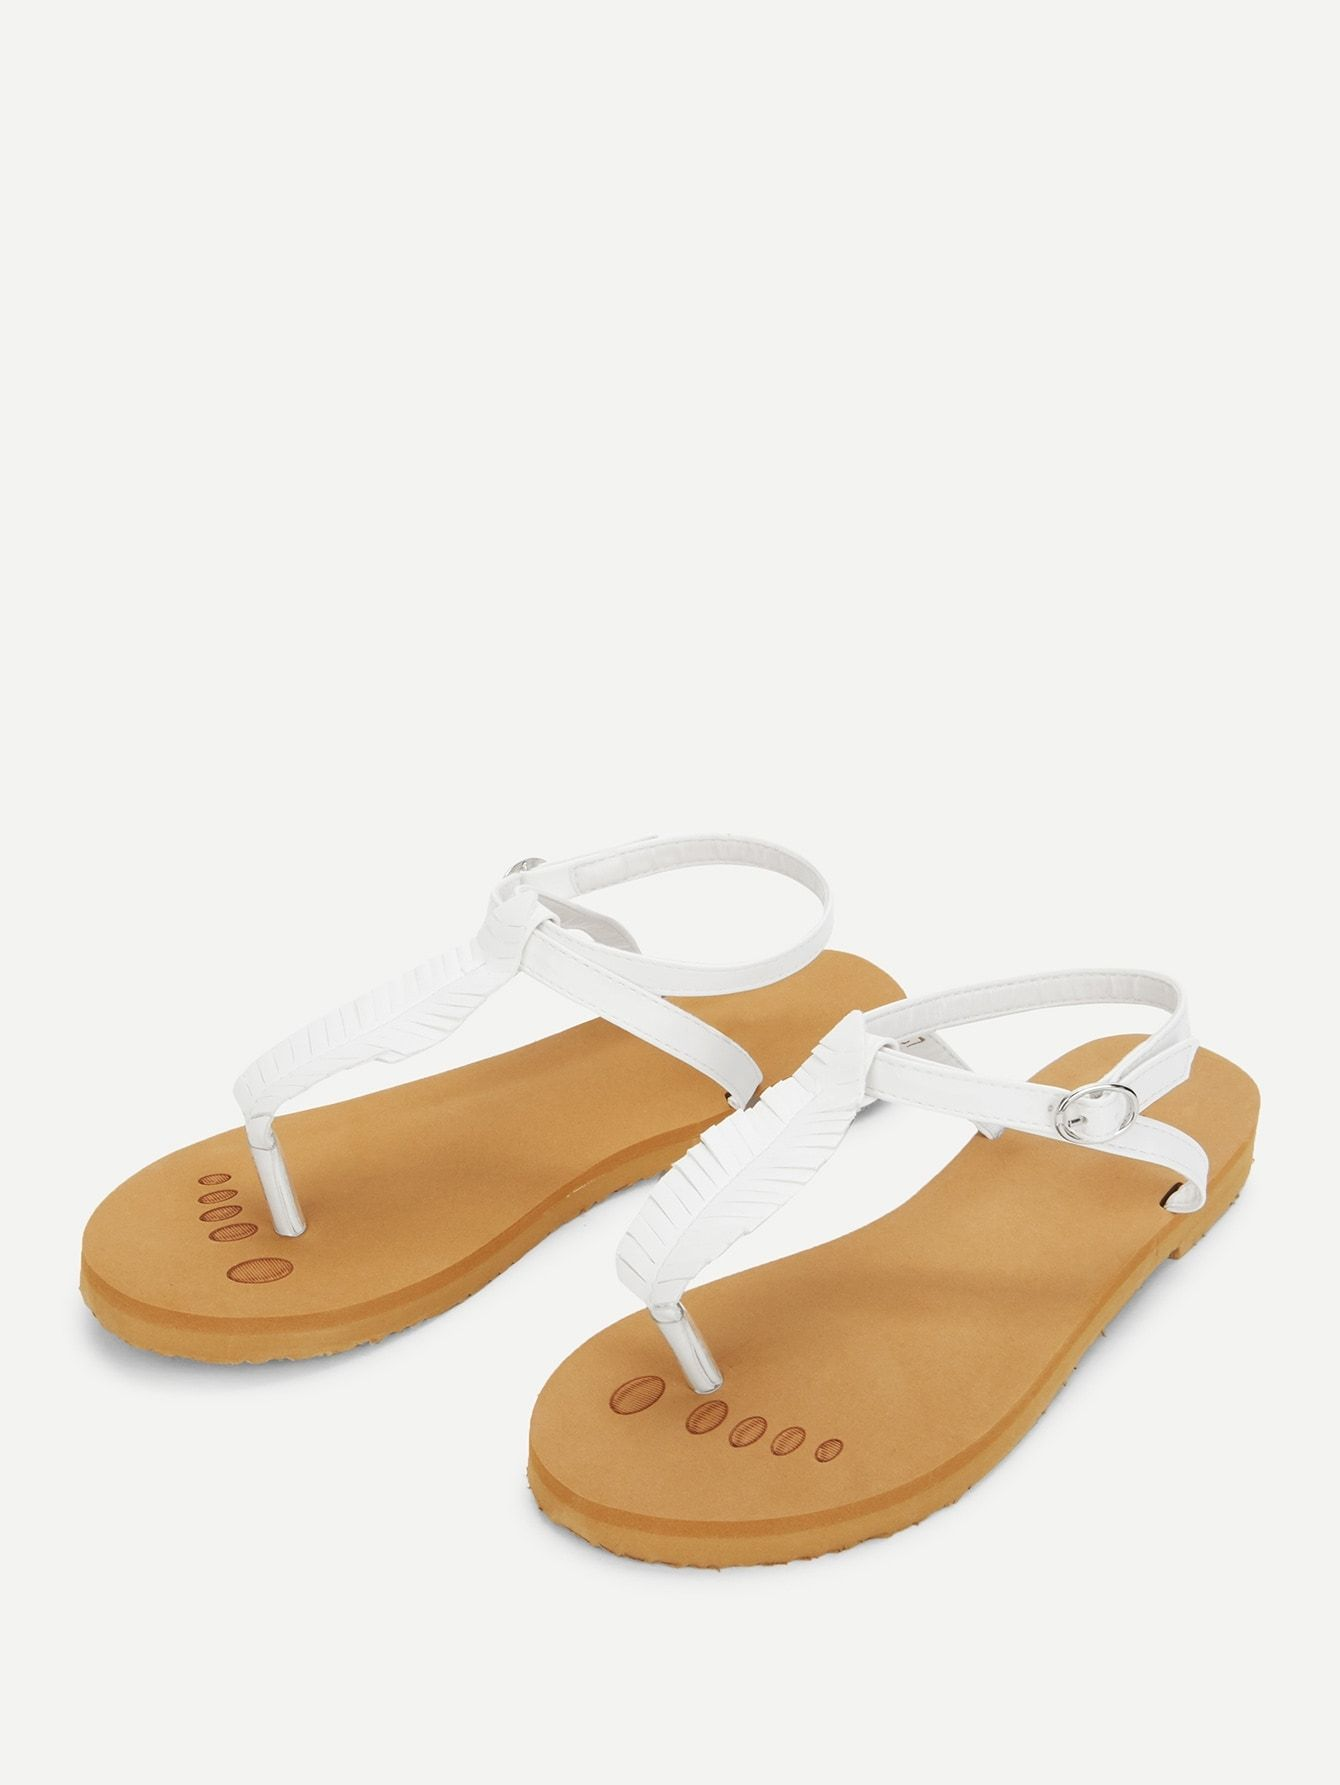 a63f48f01 Casual Strappy White Toe Post Strappy Flat Sandals | Shoe | Strappy ...